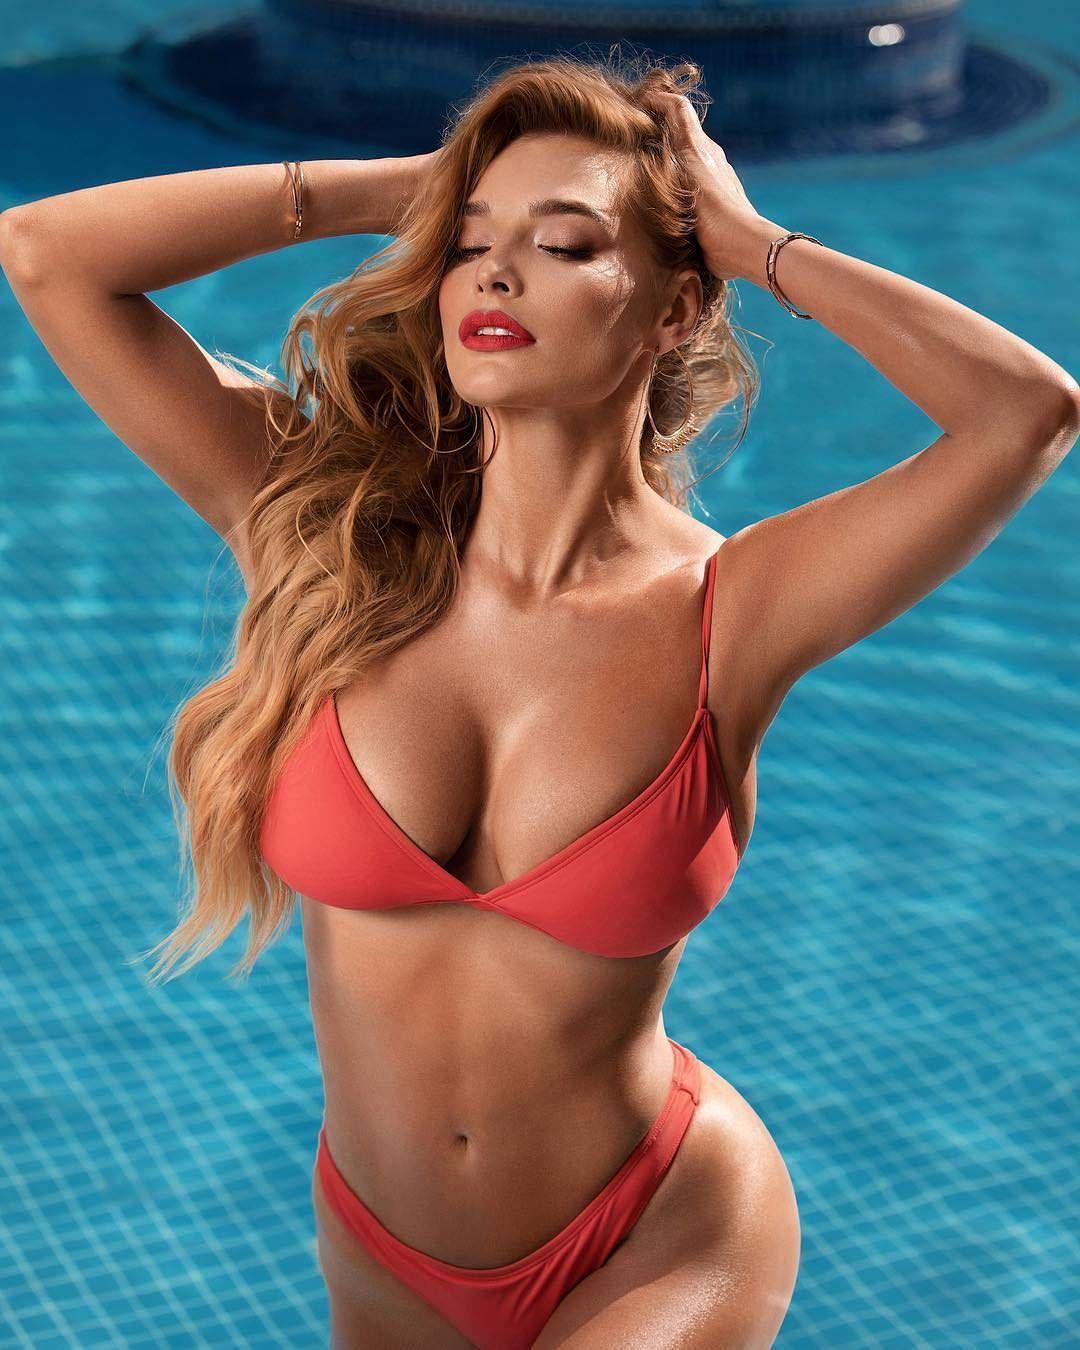 Celebrity Tatyana Kotova nudes (17 foto and video), Topless, Hot, Selfie, swimsuit 2019